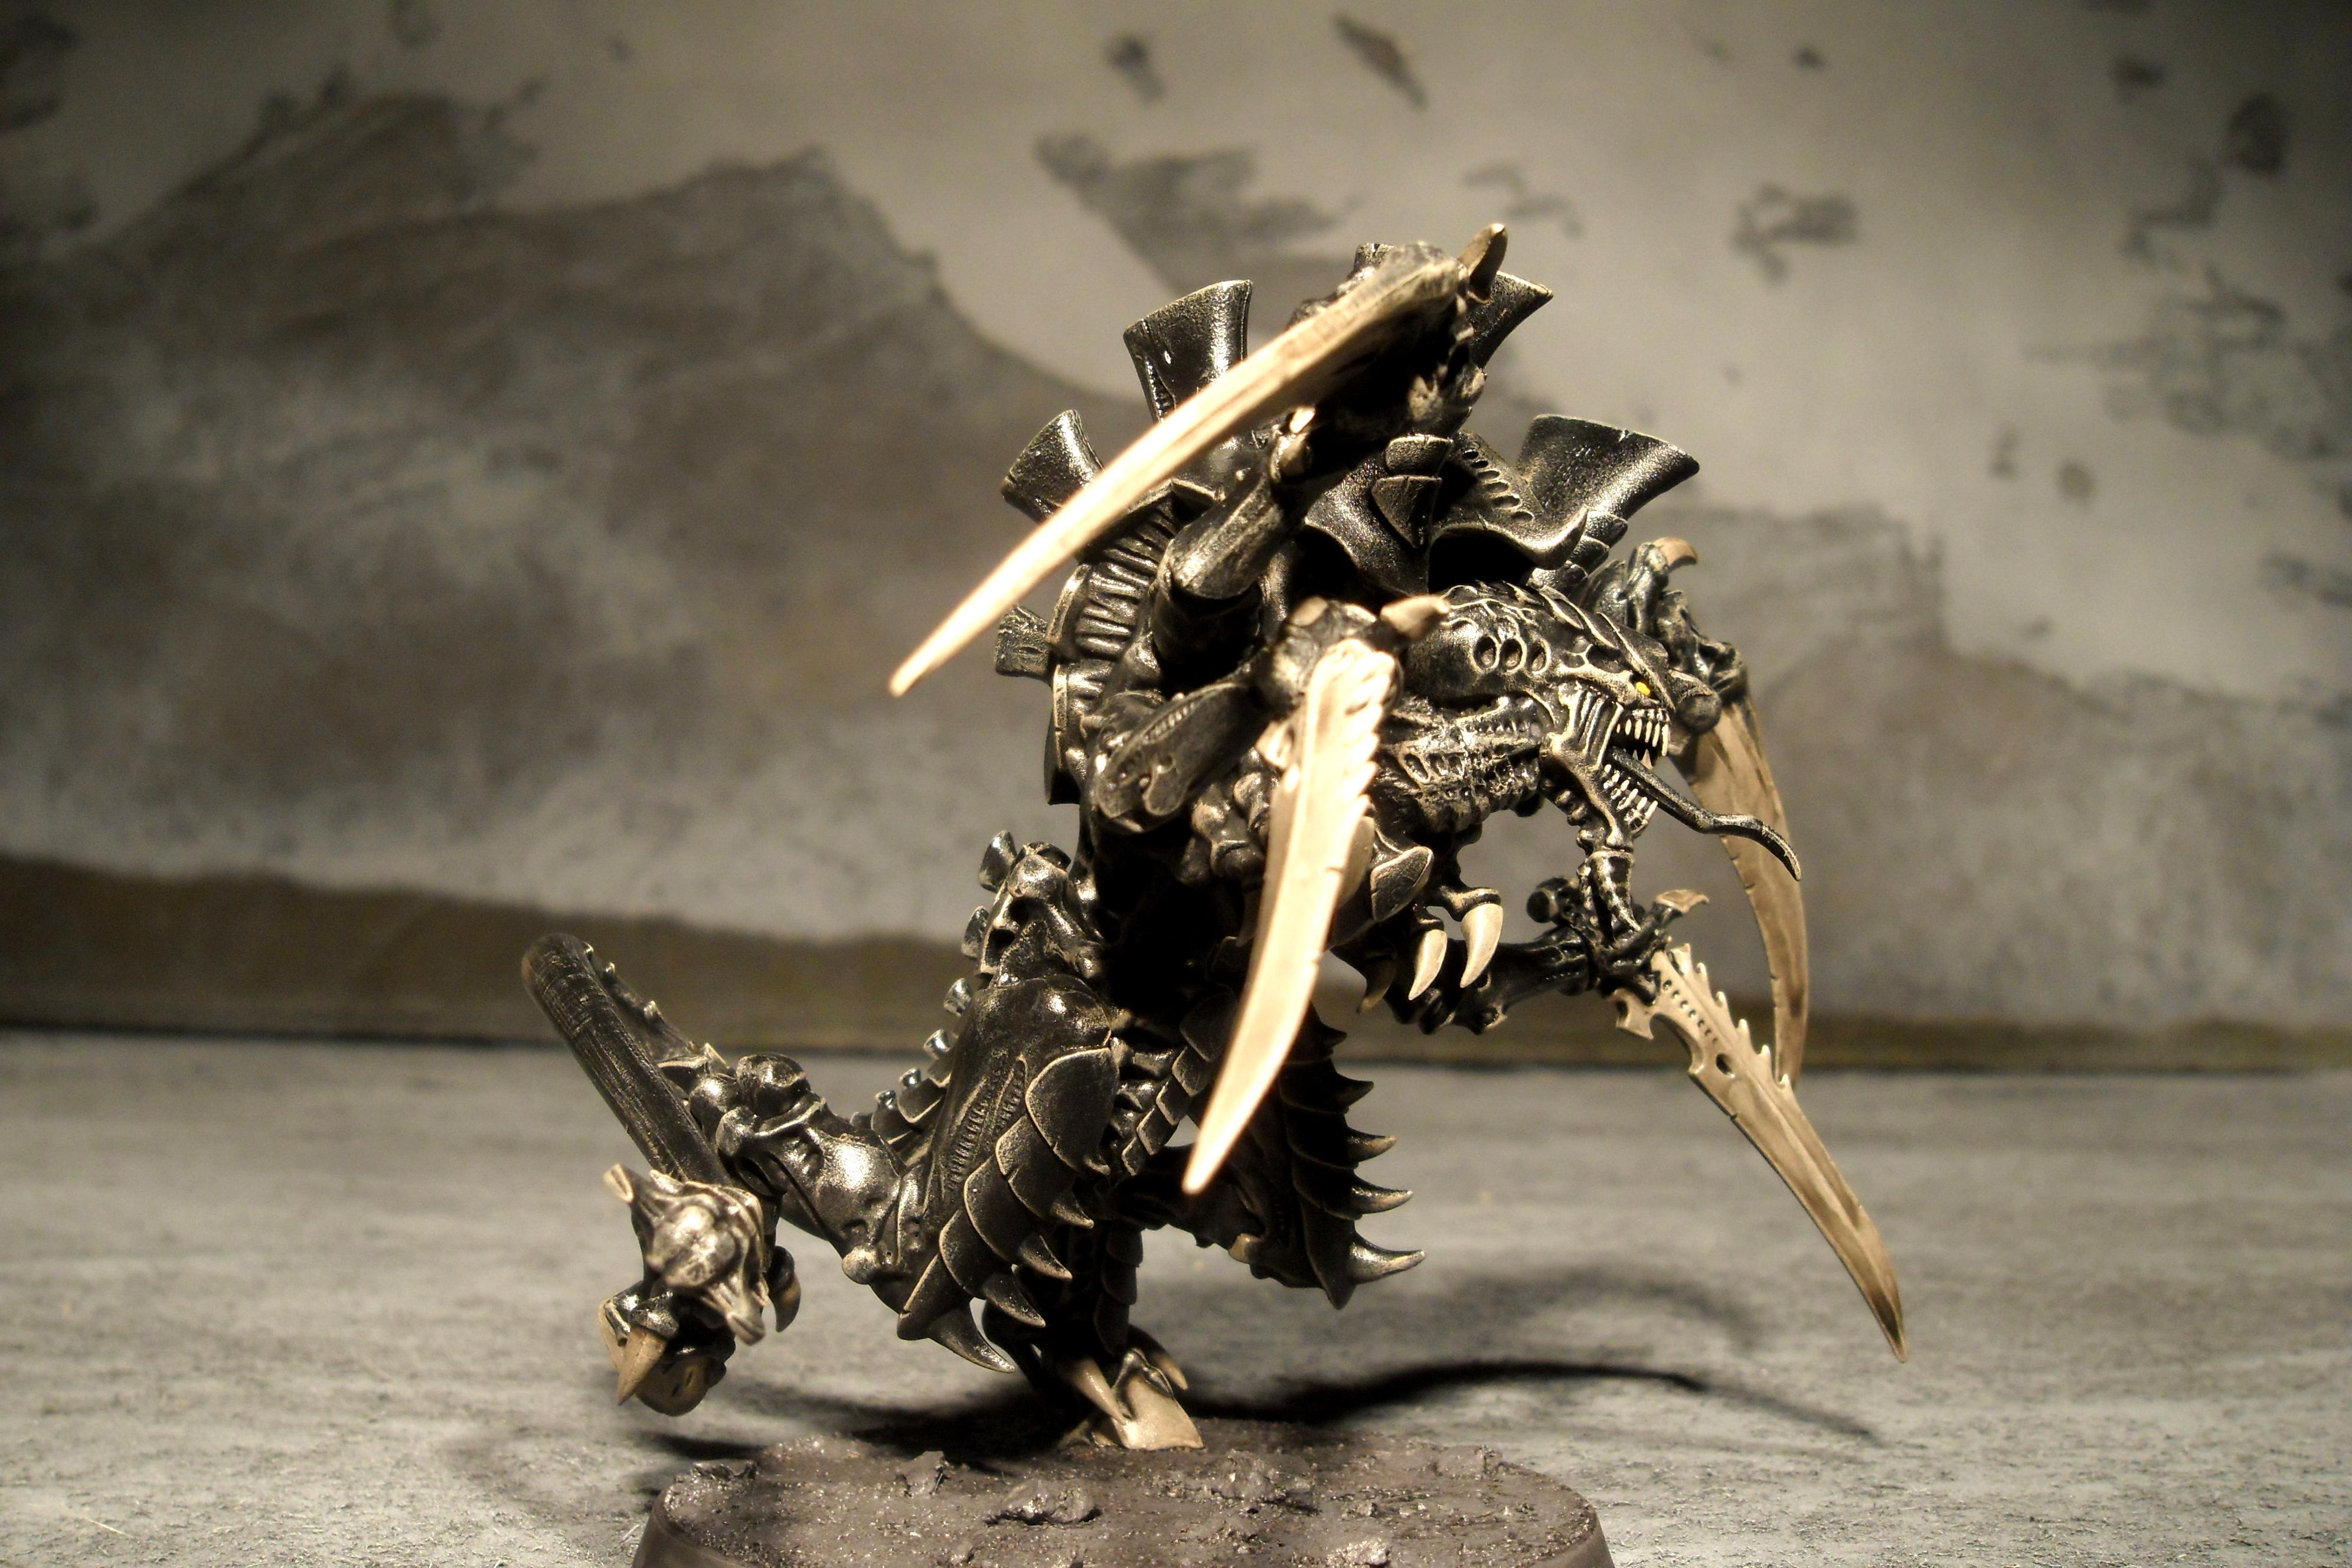 Genestealer, Hive Tyrant, Swarm, Swarmlord, Tyranids, Warhammer 40,000